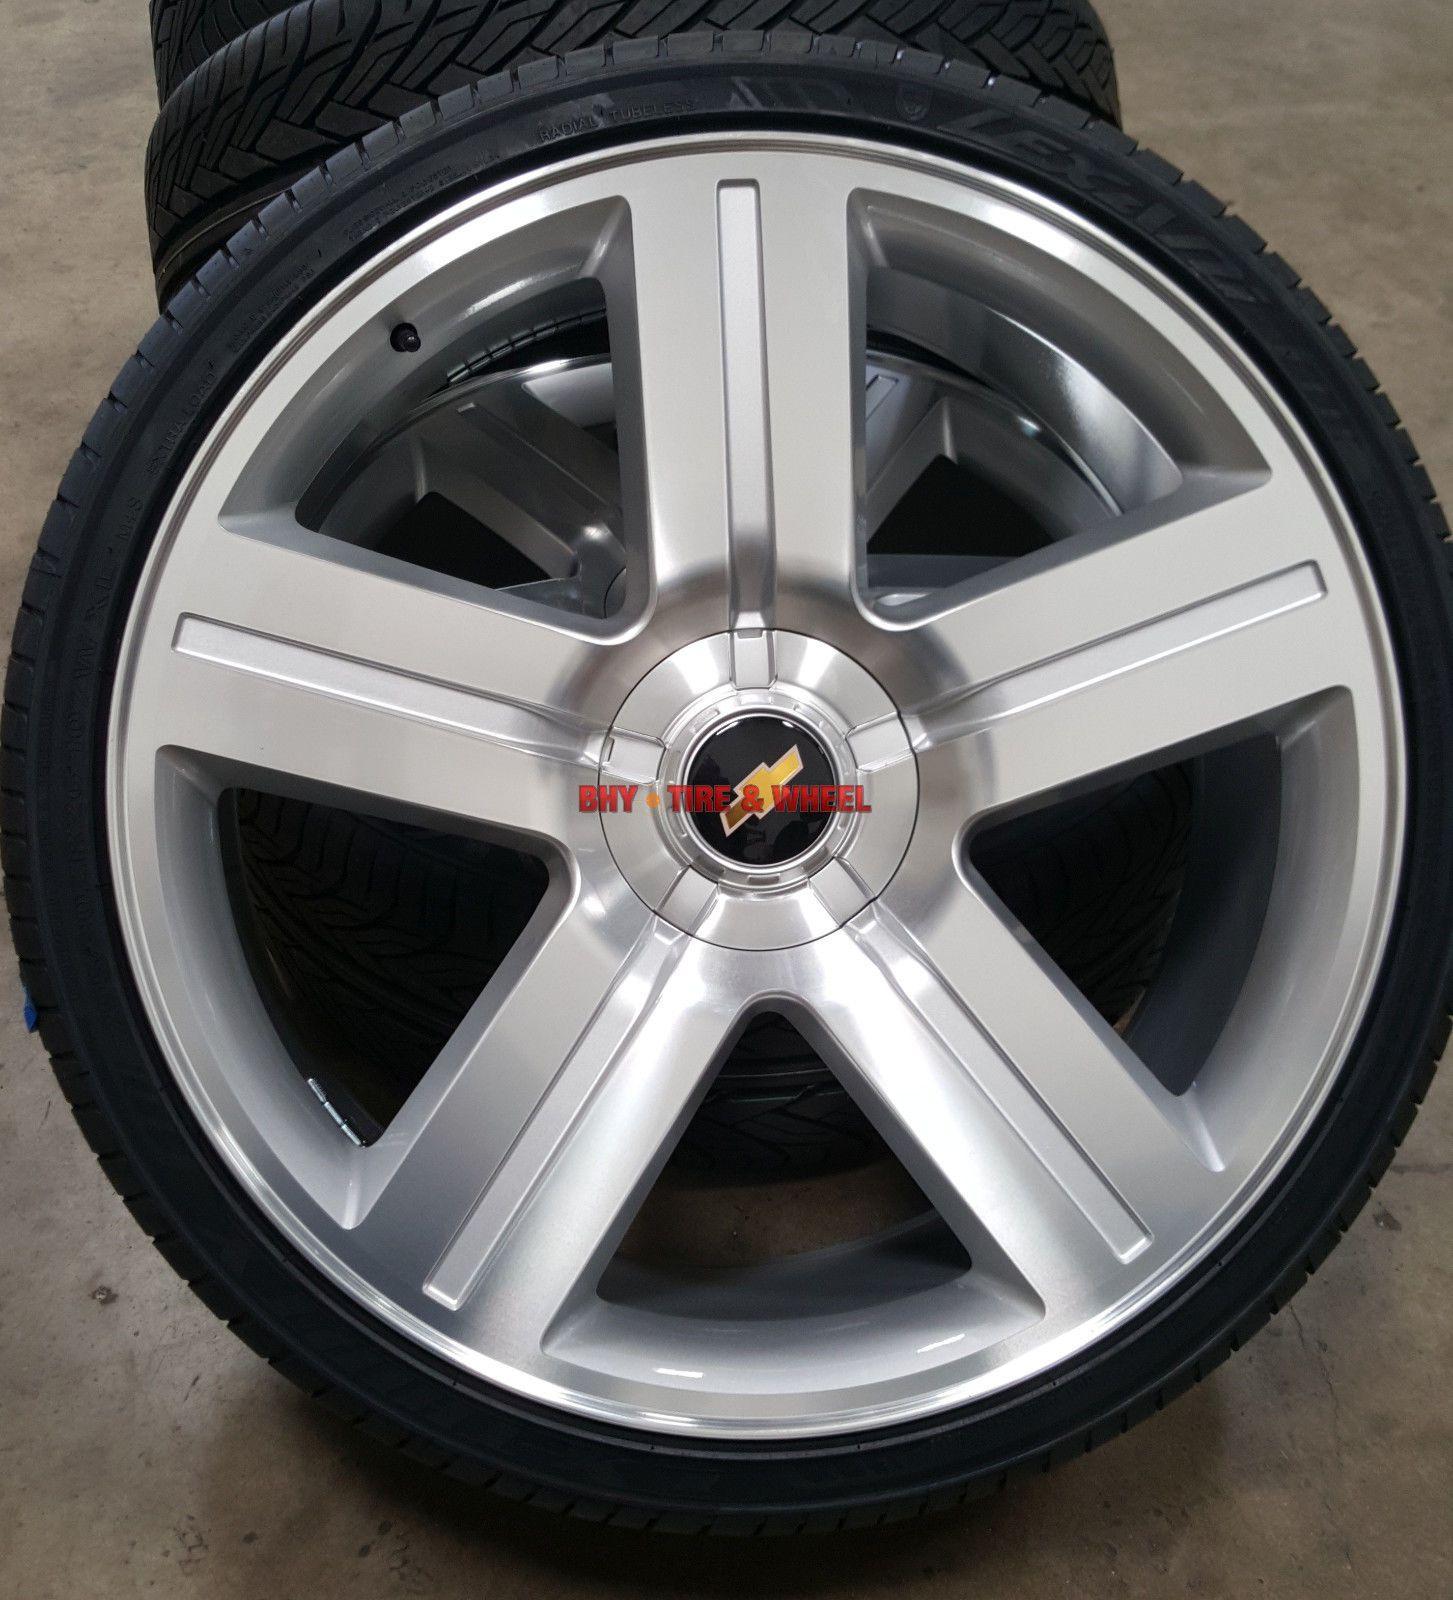 24 Inch Wheels And Tires Texas Edition Style Rims Silverado Silver